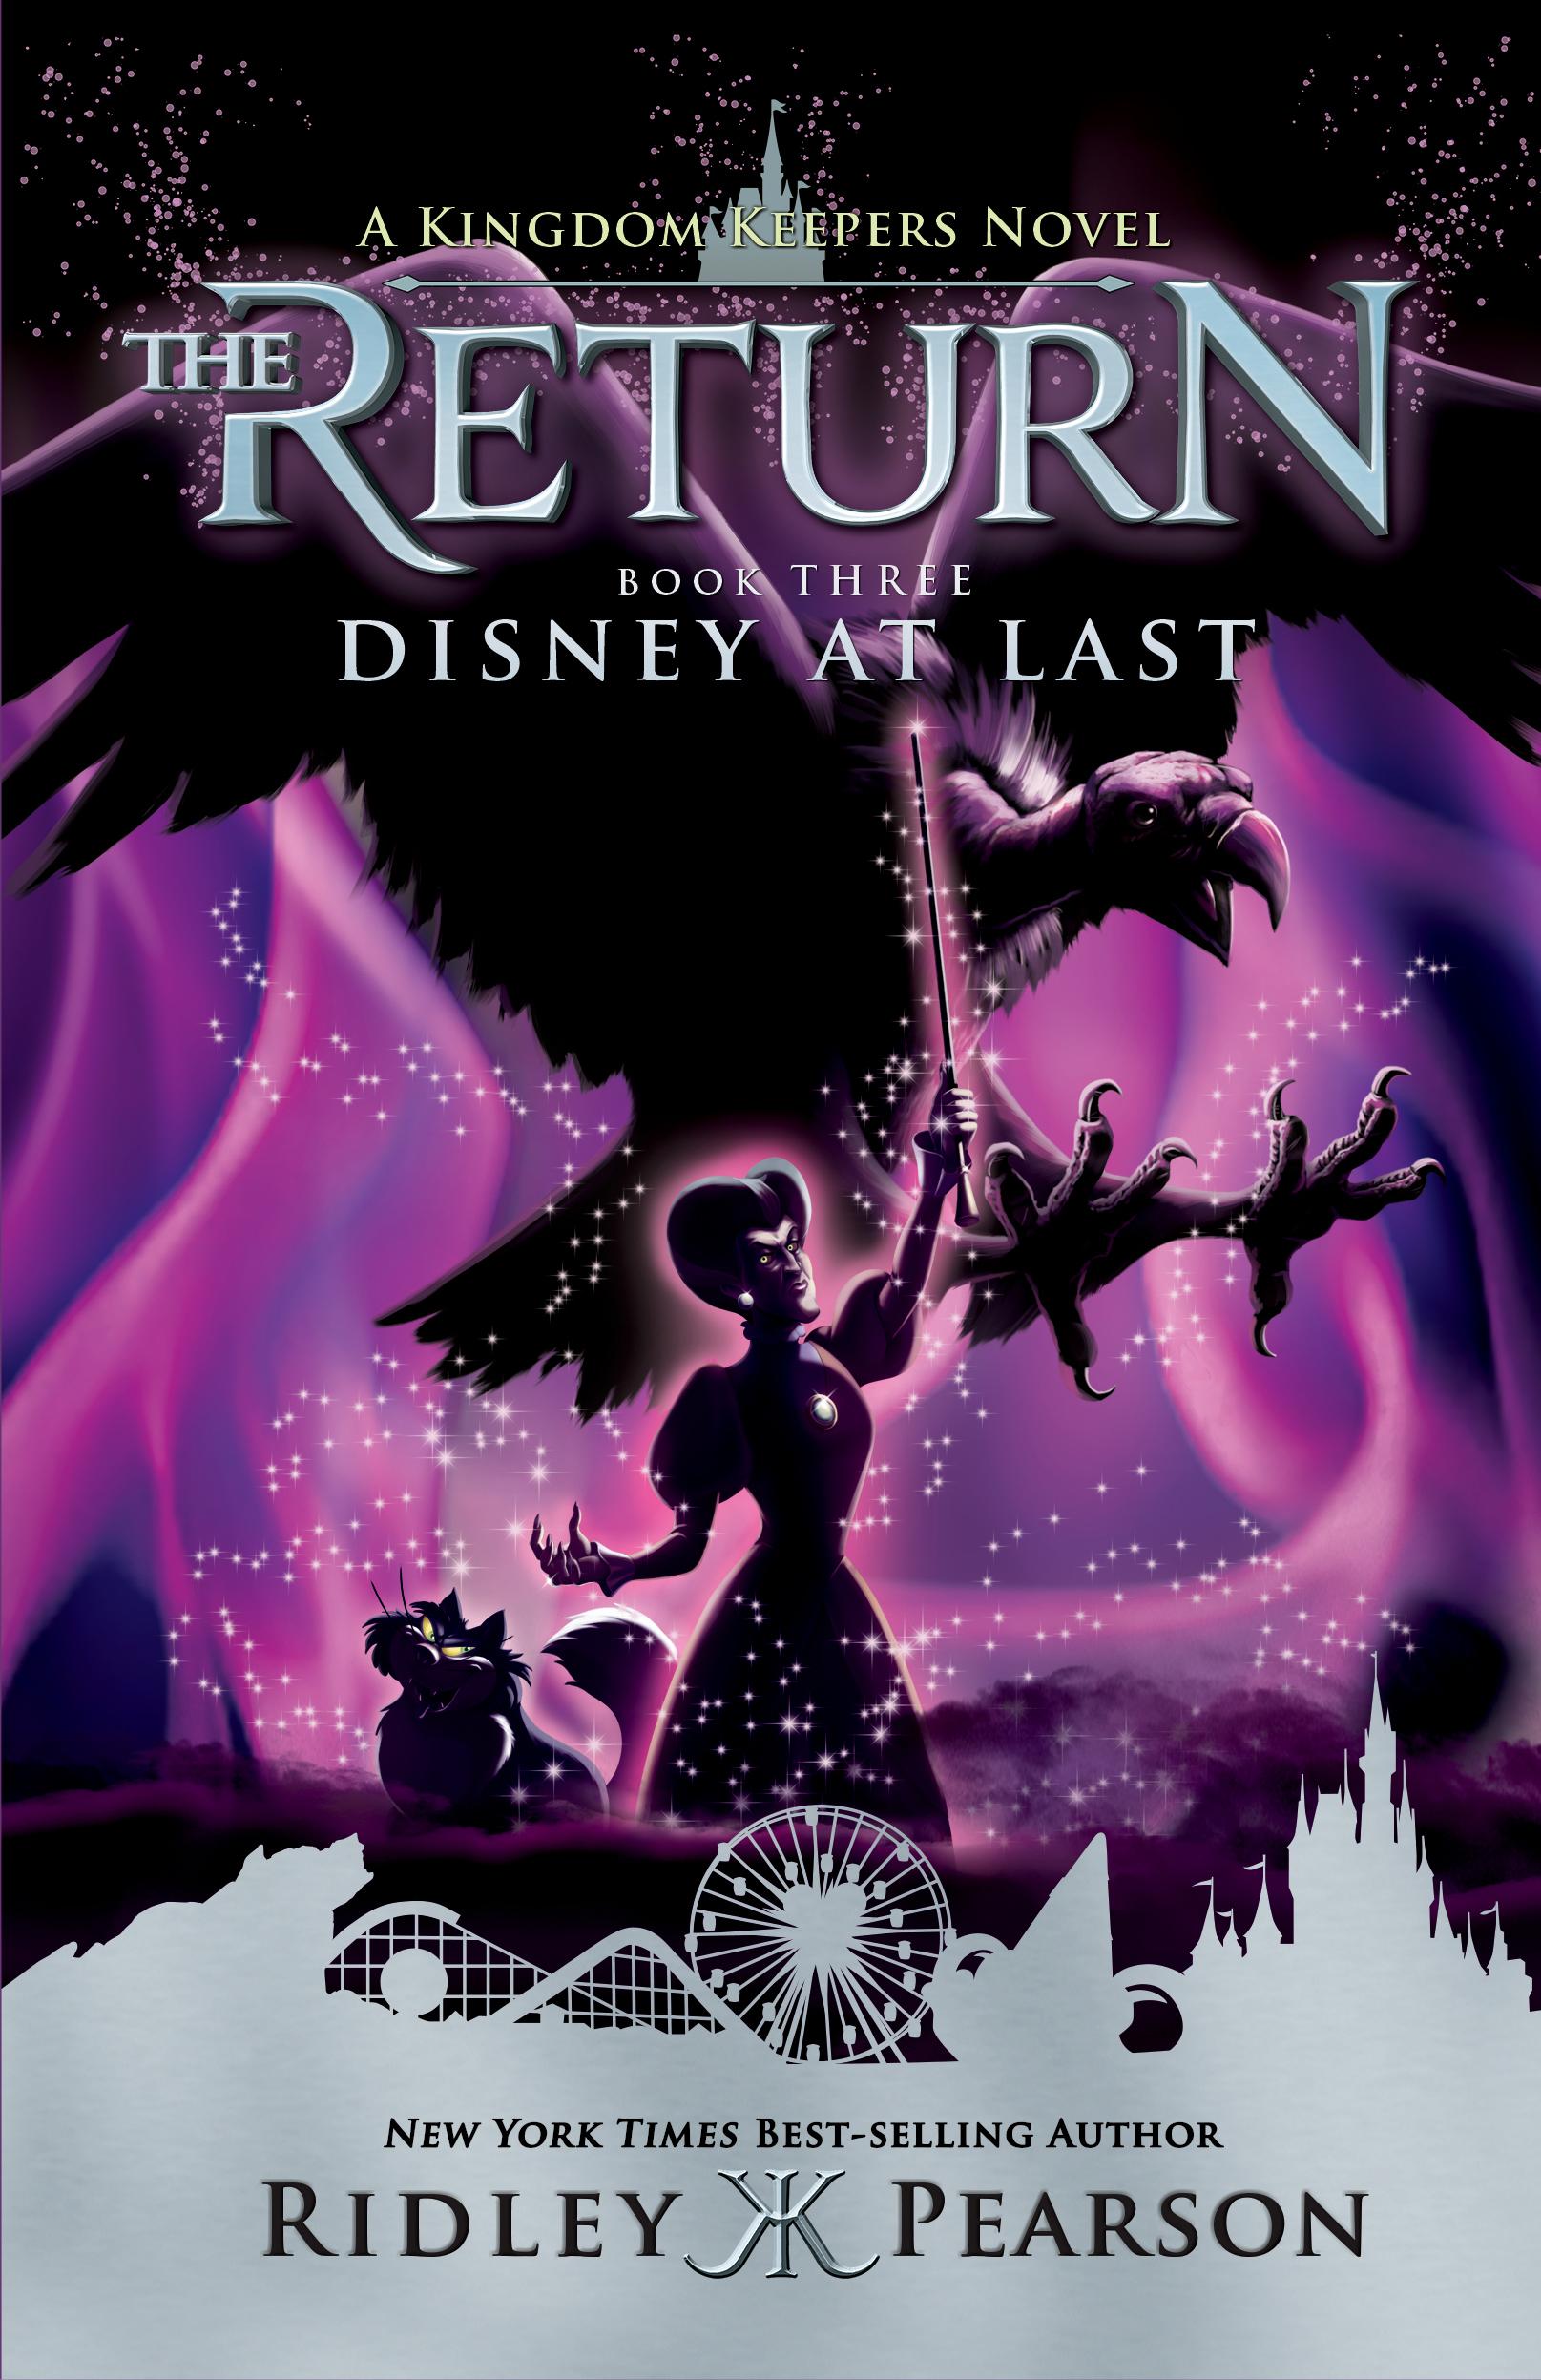 Kingdom Keepers: The Return, Book 3: Disney at Last